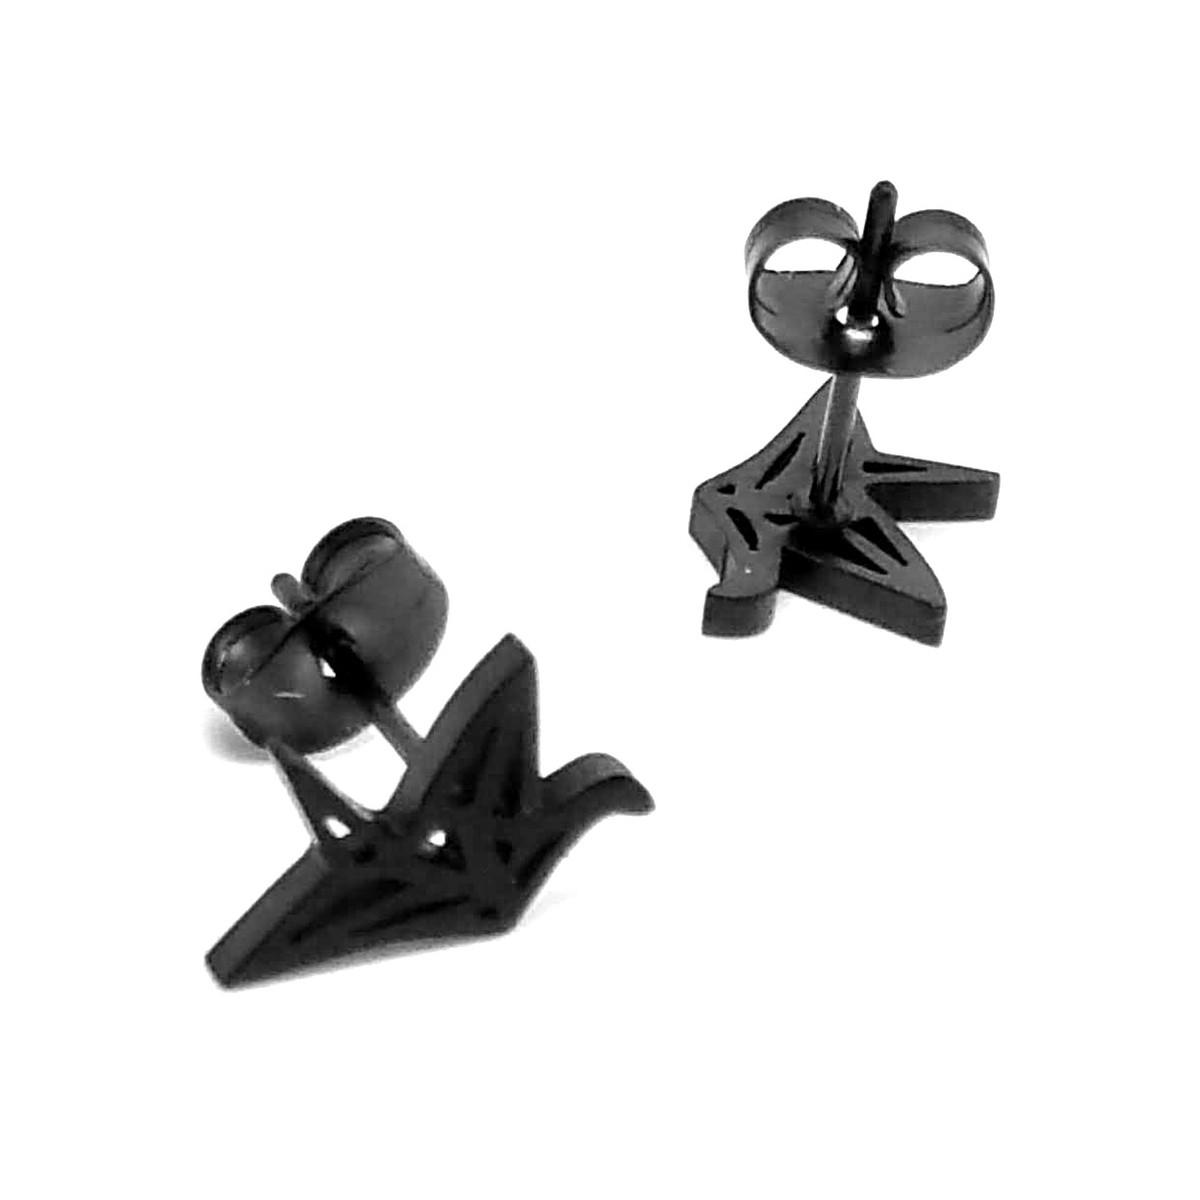 Tiny Black Origami Crane Outline Post Earrings - Joji Boutique | 1200x1200